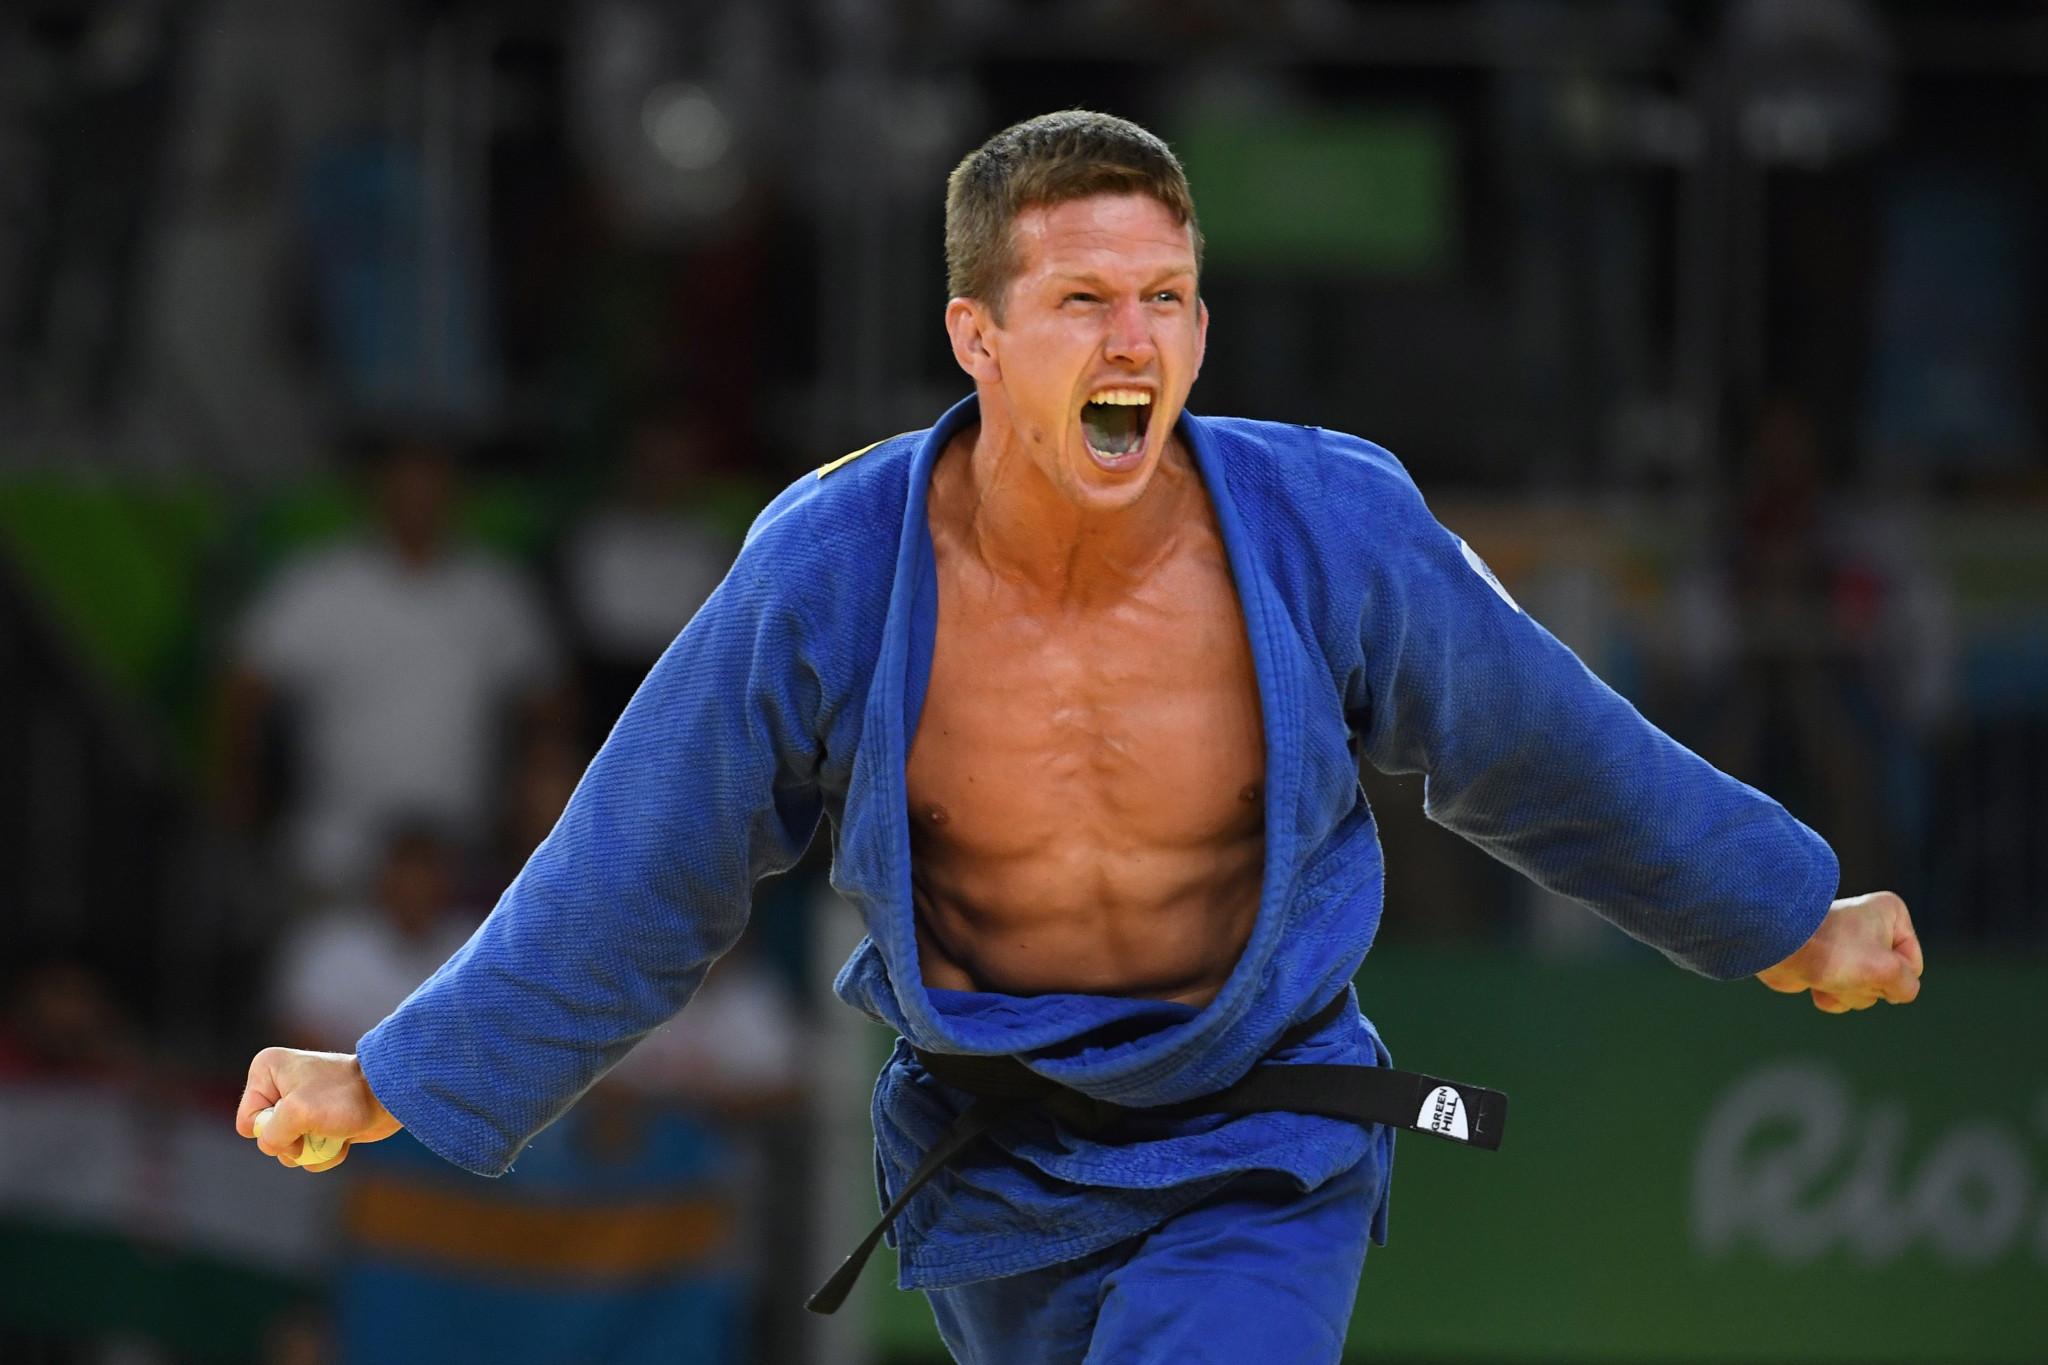 Olympic bronze medallist Van Tichelt retires from judo due to neck injury